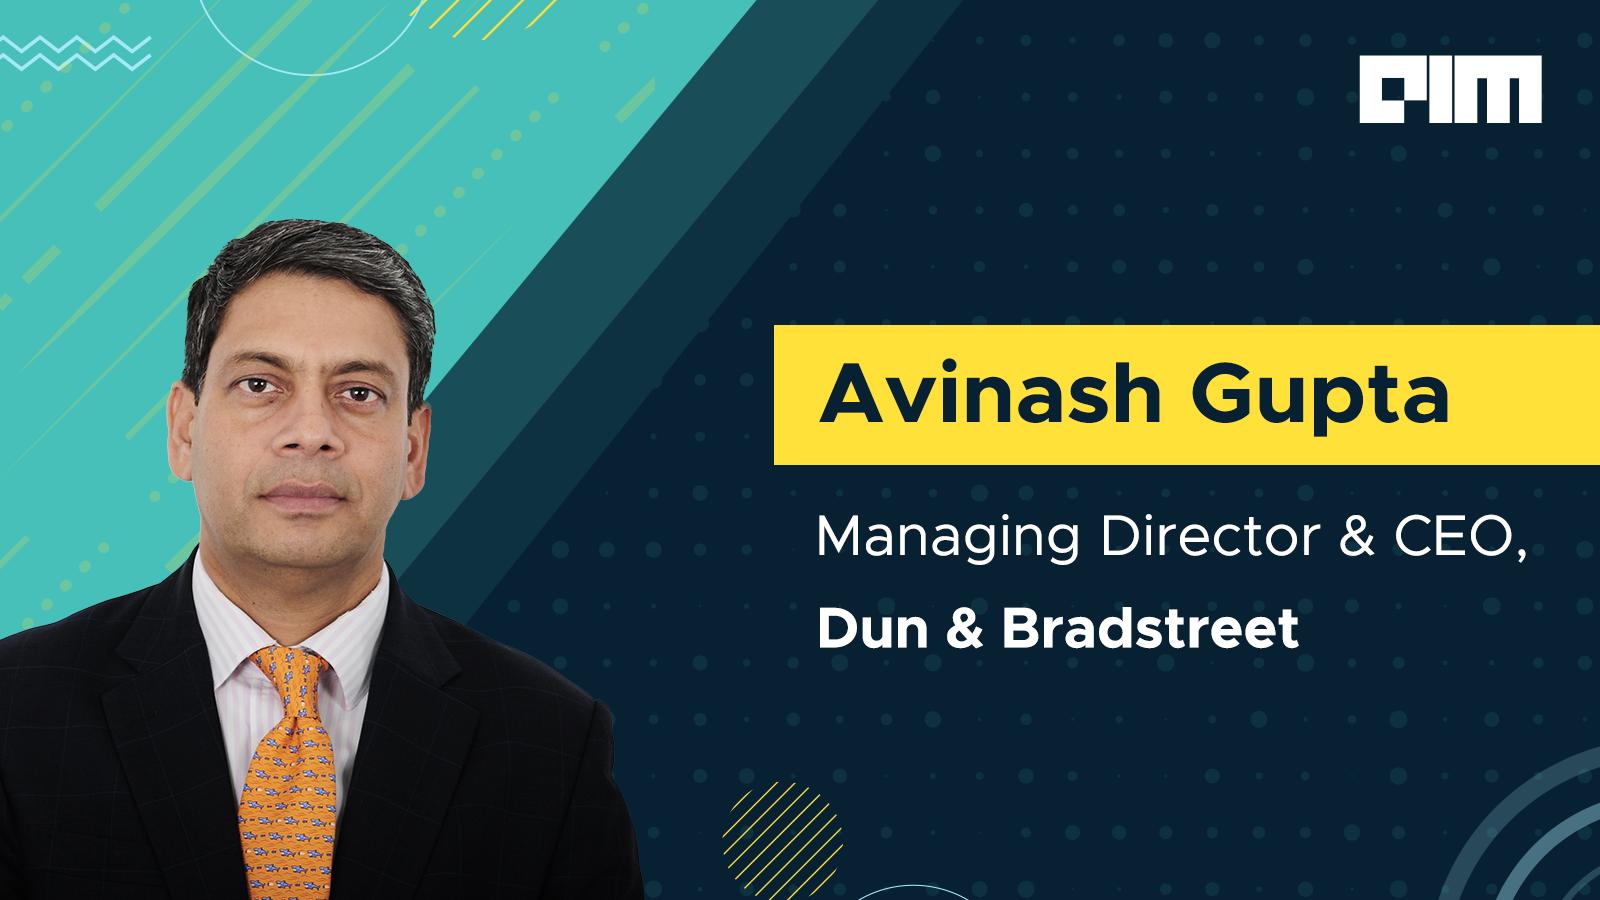 Interview: Avinash Gupta, Managing Director & CEO - India, Dun & Bradstreet